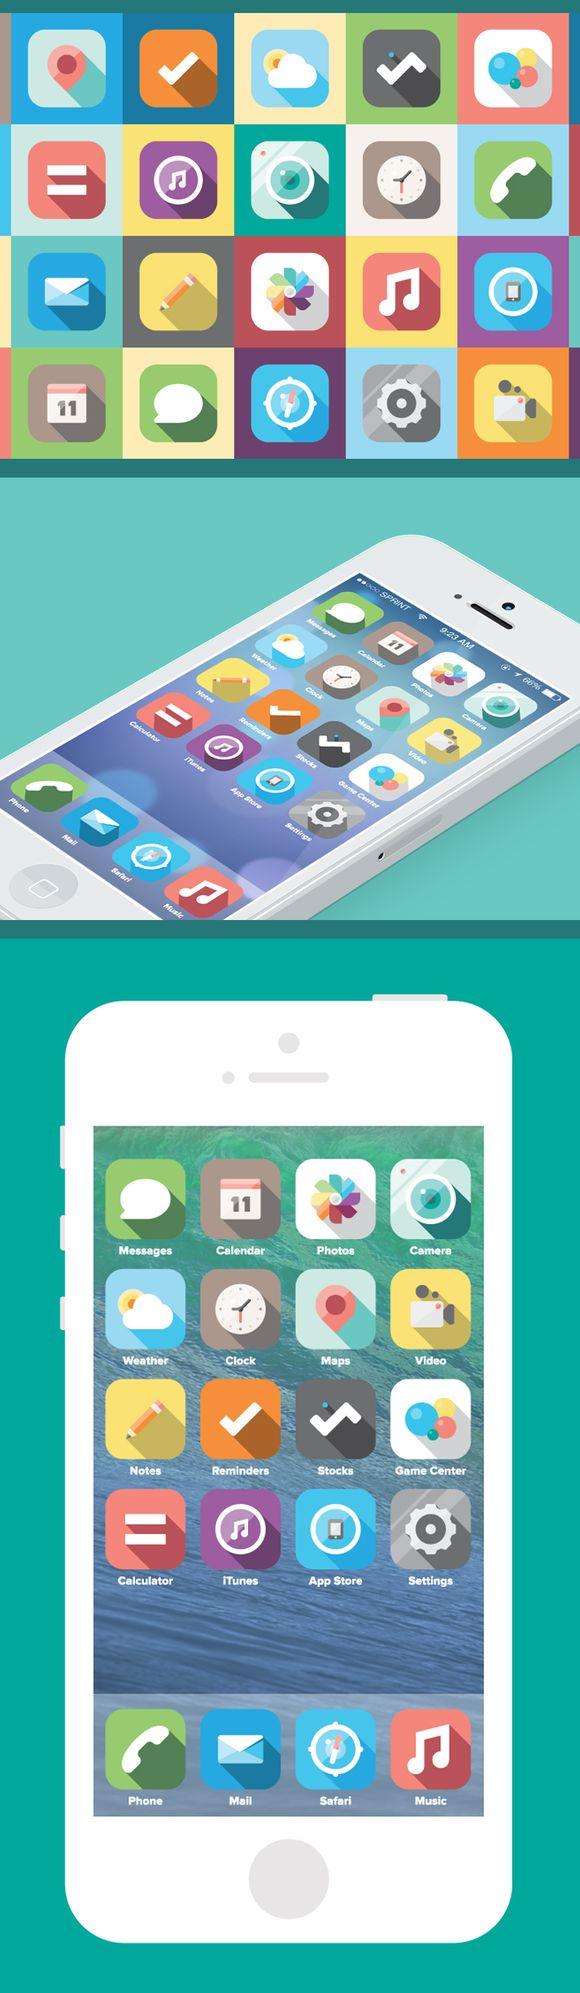 ios7 icon design